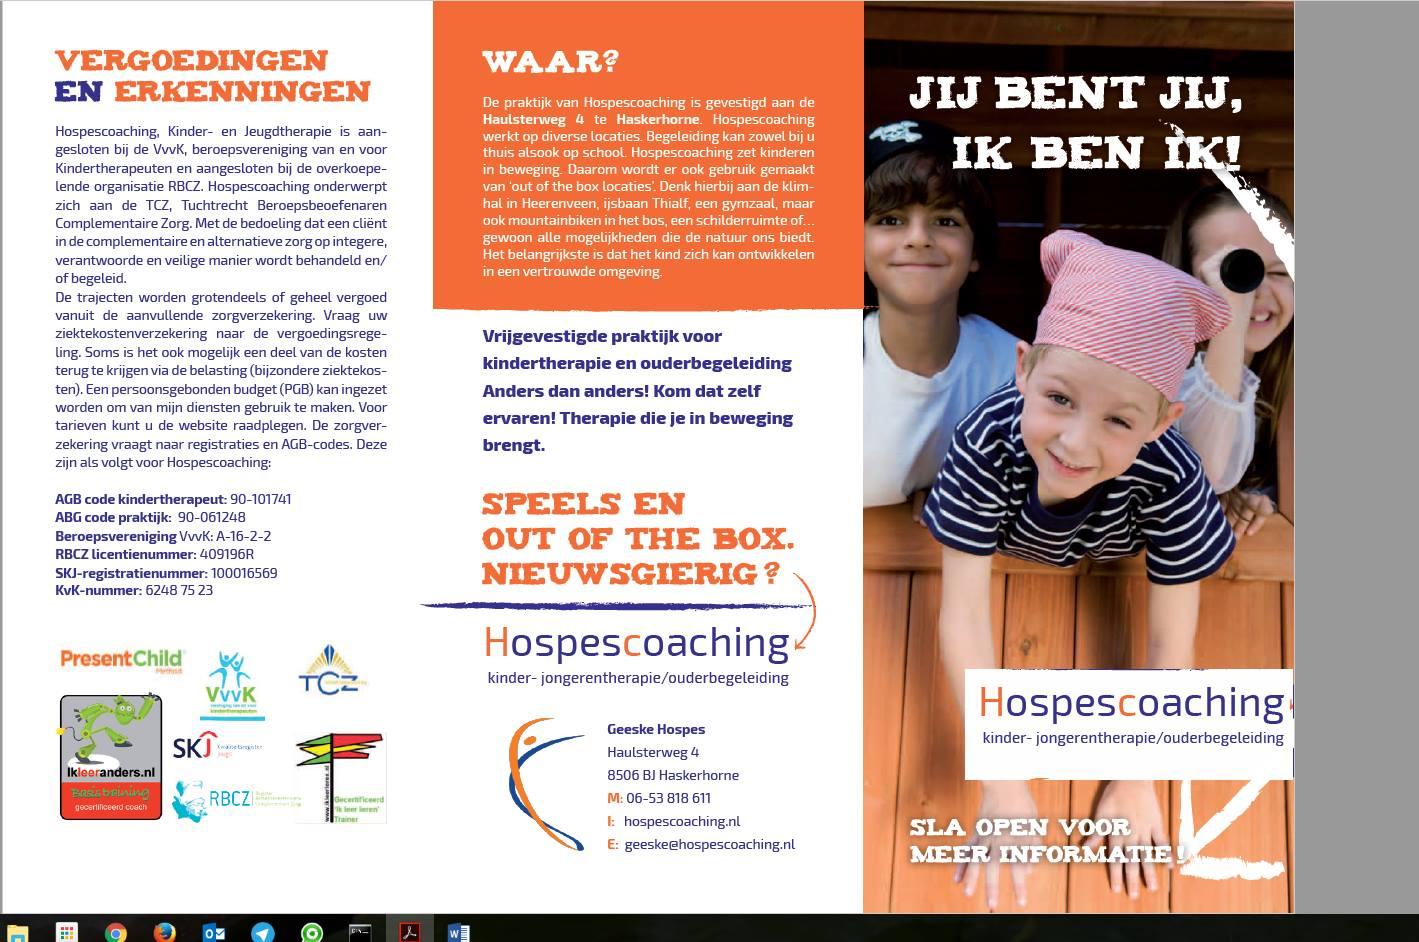 Ambulante hulpverlening, jeugd, friesland